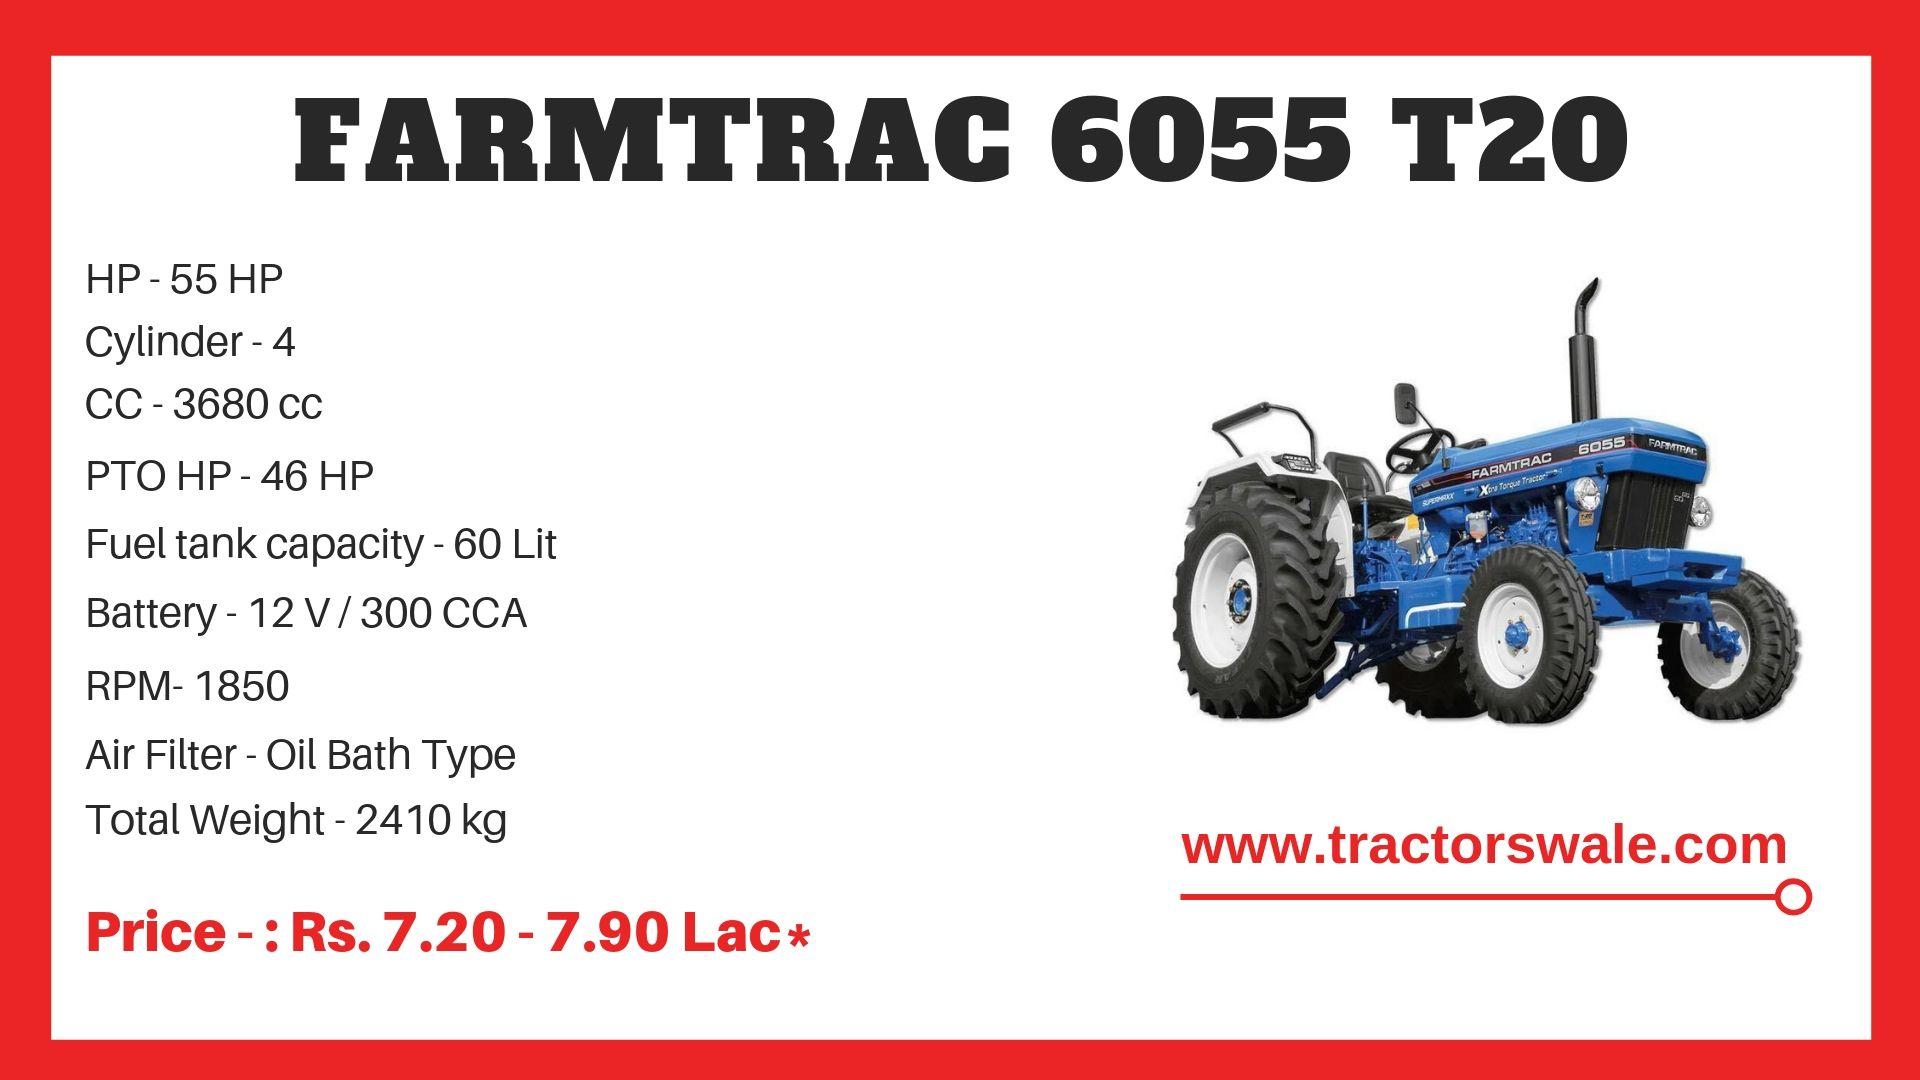 Farmtrac 6055 T20 Escorts Tractor specifications